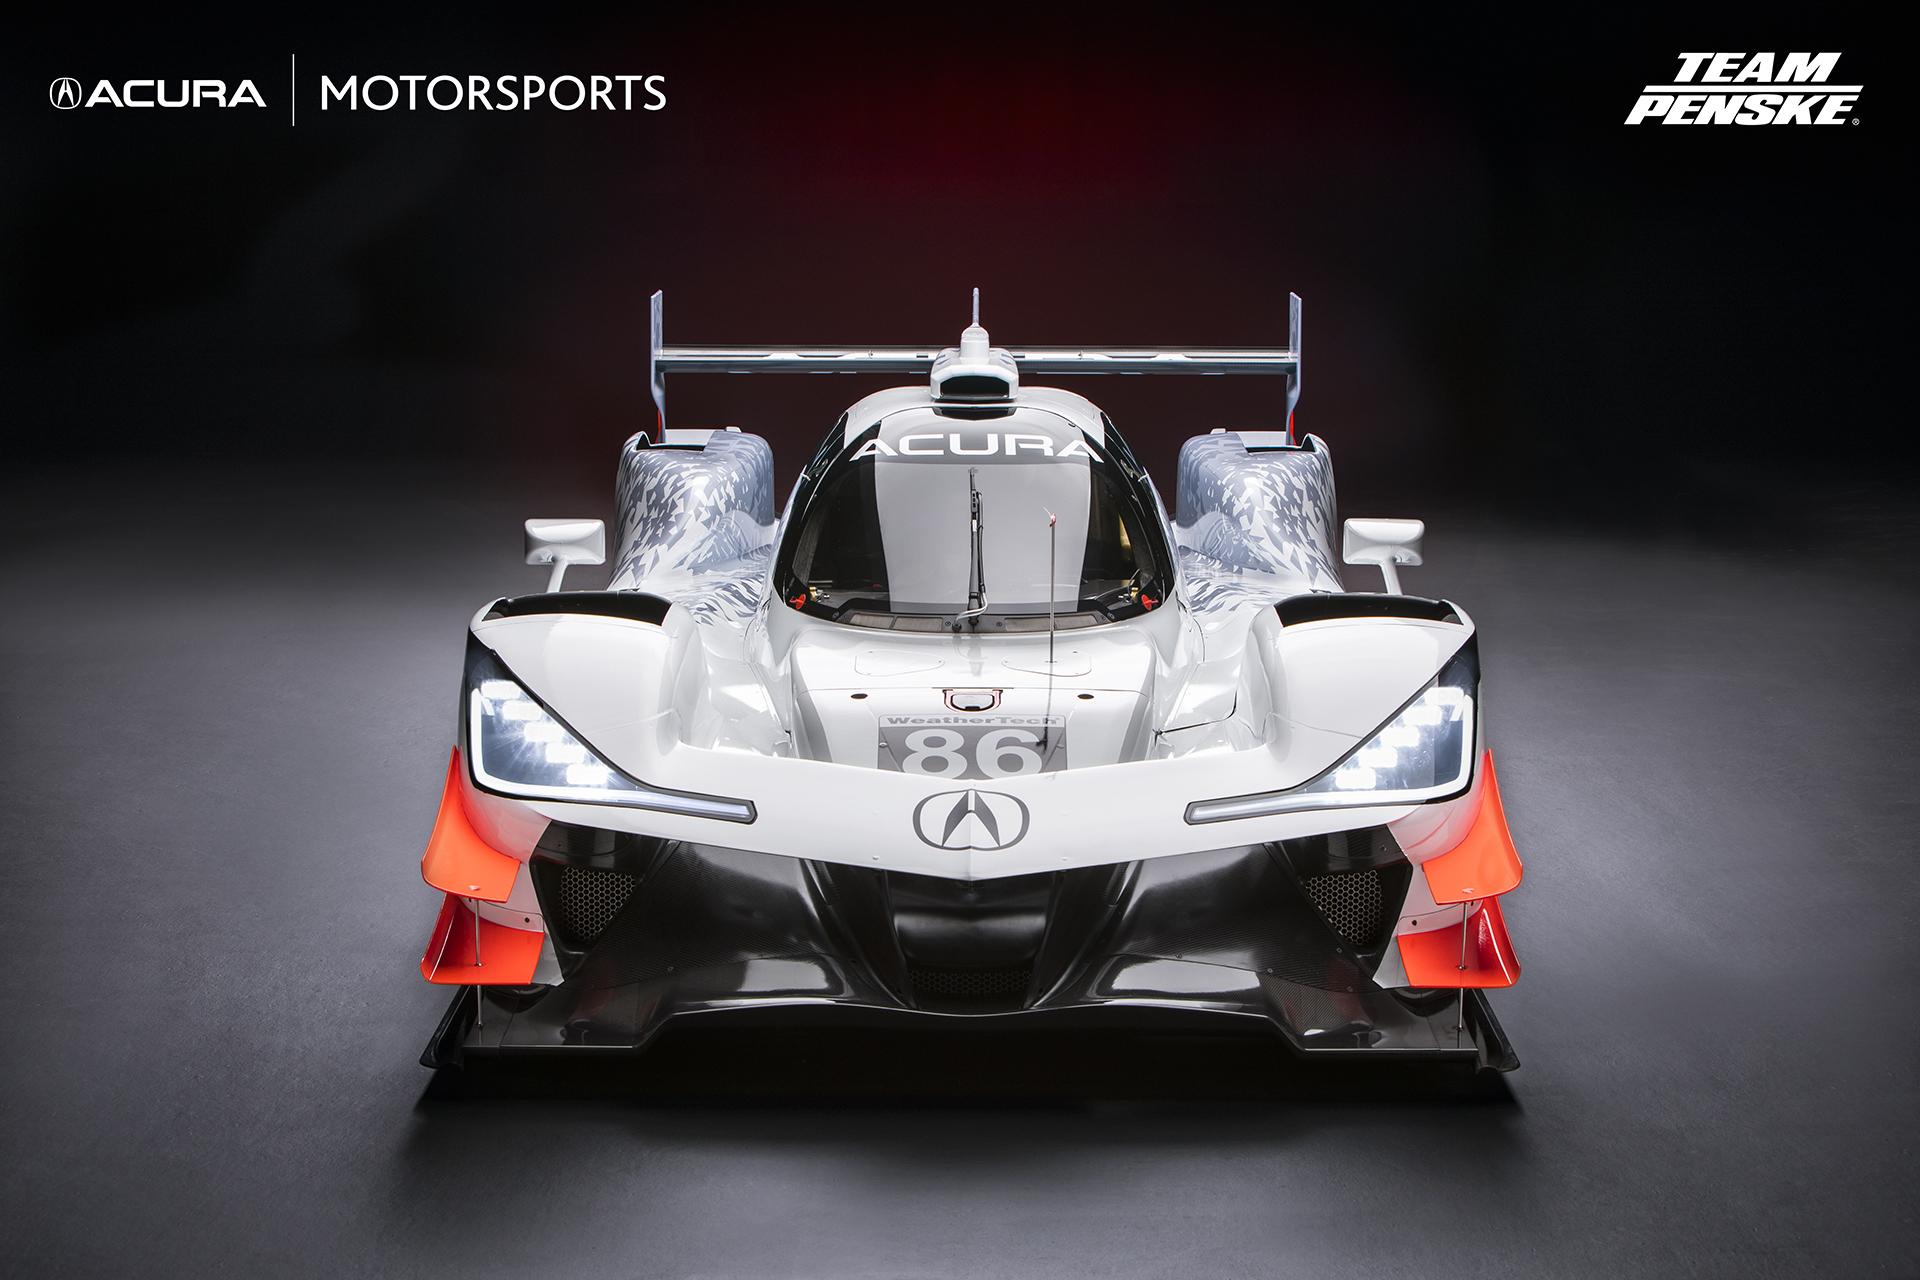 Team Penske Unveils 2018 Acura Arx 05 Dpi Race Car For Imsa